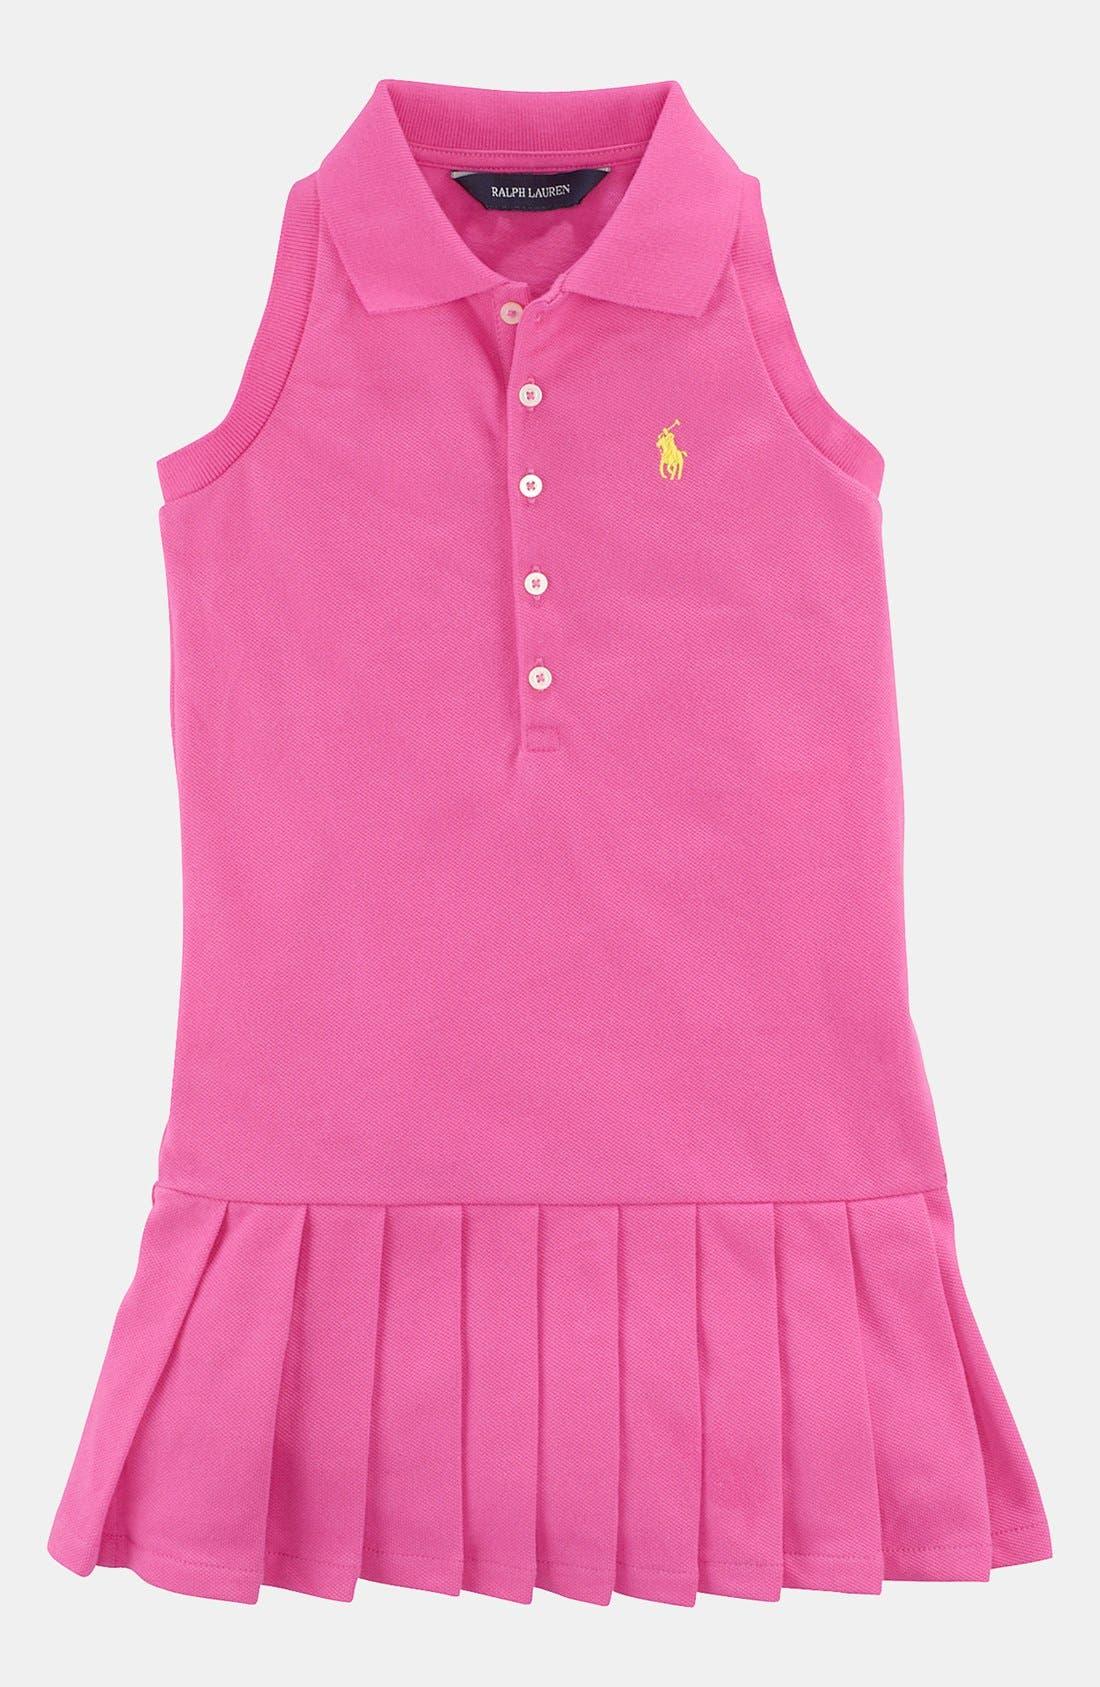 Main Image - Ralph Lauren Pleated Polo Dress (Toddler)